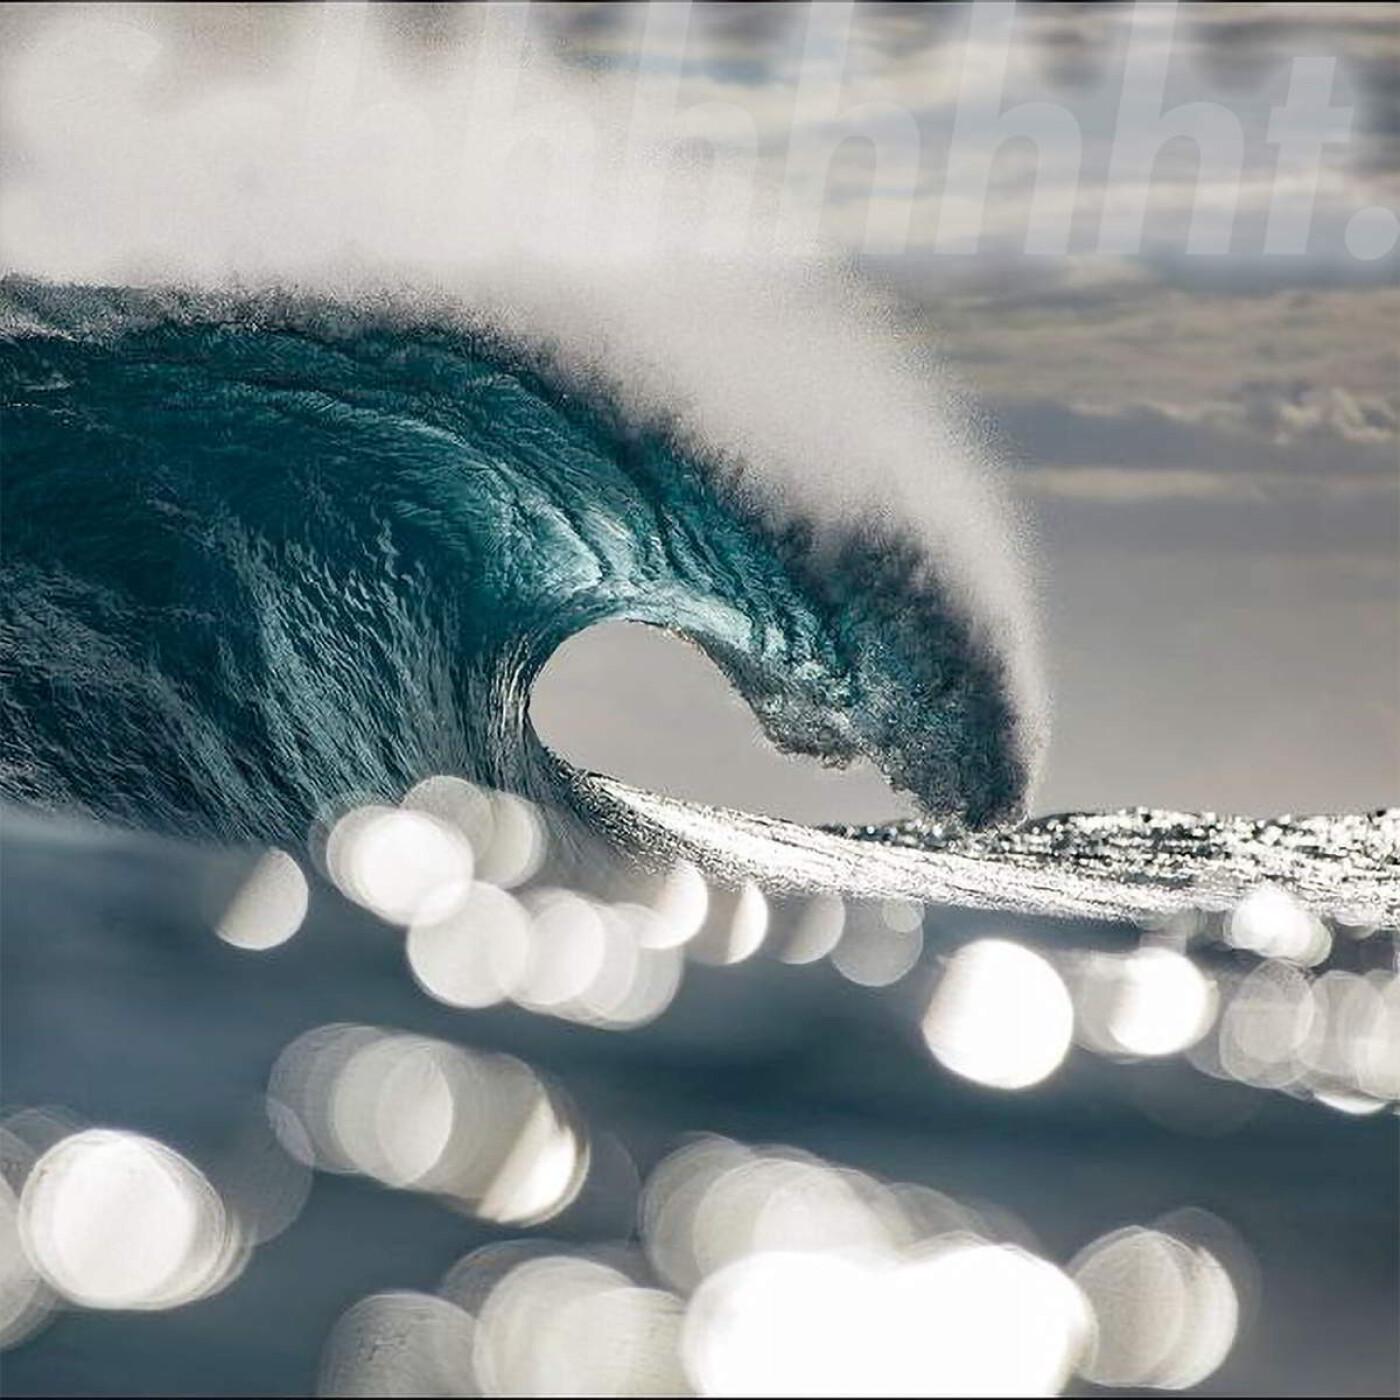 Schhhhhhht 14 - Journée Mondiale des océans - 08 06 21 - StereoChic Radio